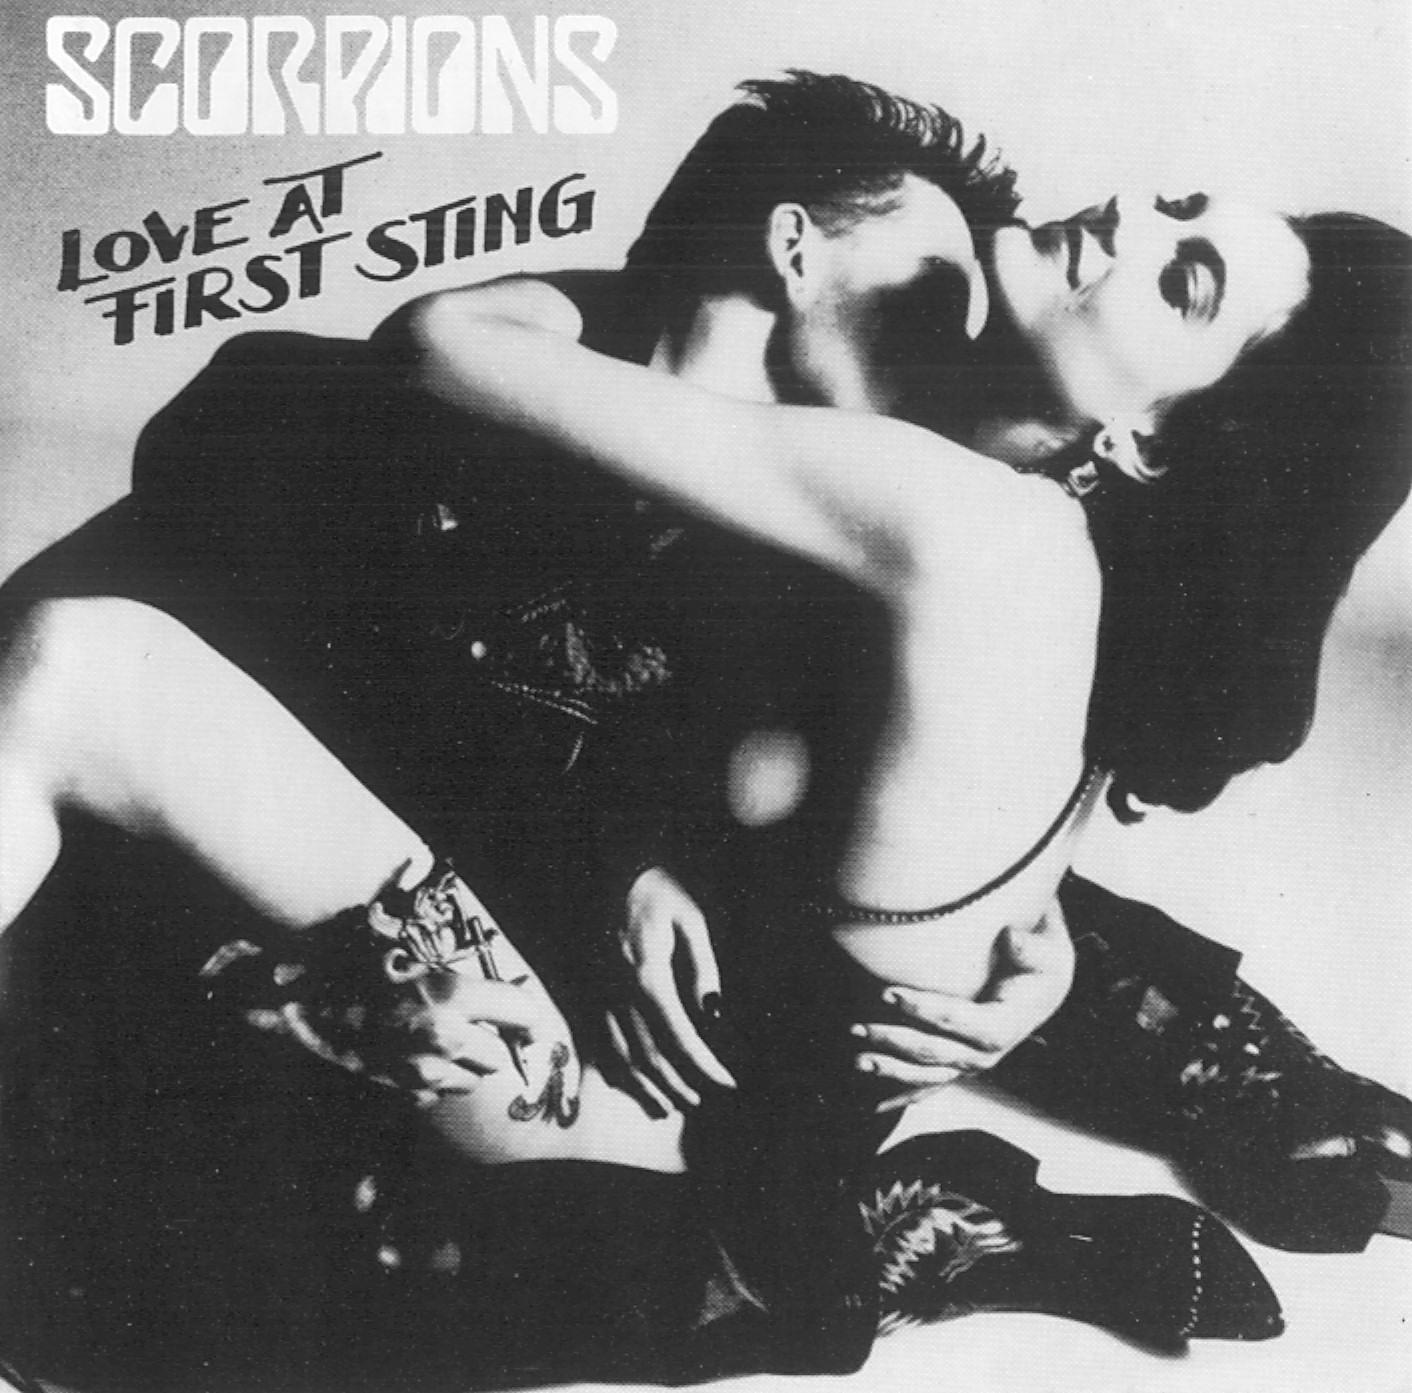 http://2.bp.blogspot.com/_yRxfvH6kBOI/TM4MyvVeBzI/AAAAAAAABt4/lCdRHSkJy-I/s1600/Scorpions+-+Love+At+First+Sting-Front.jpg